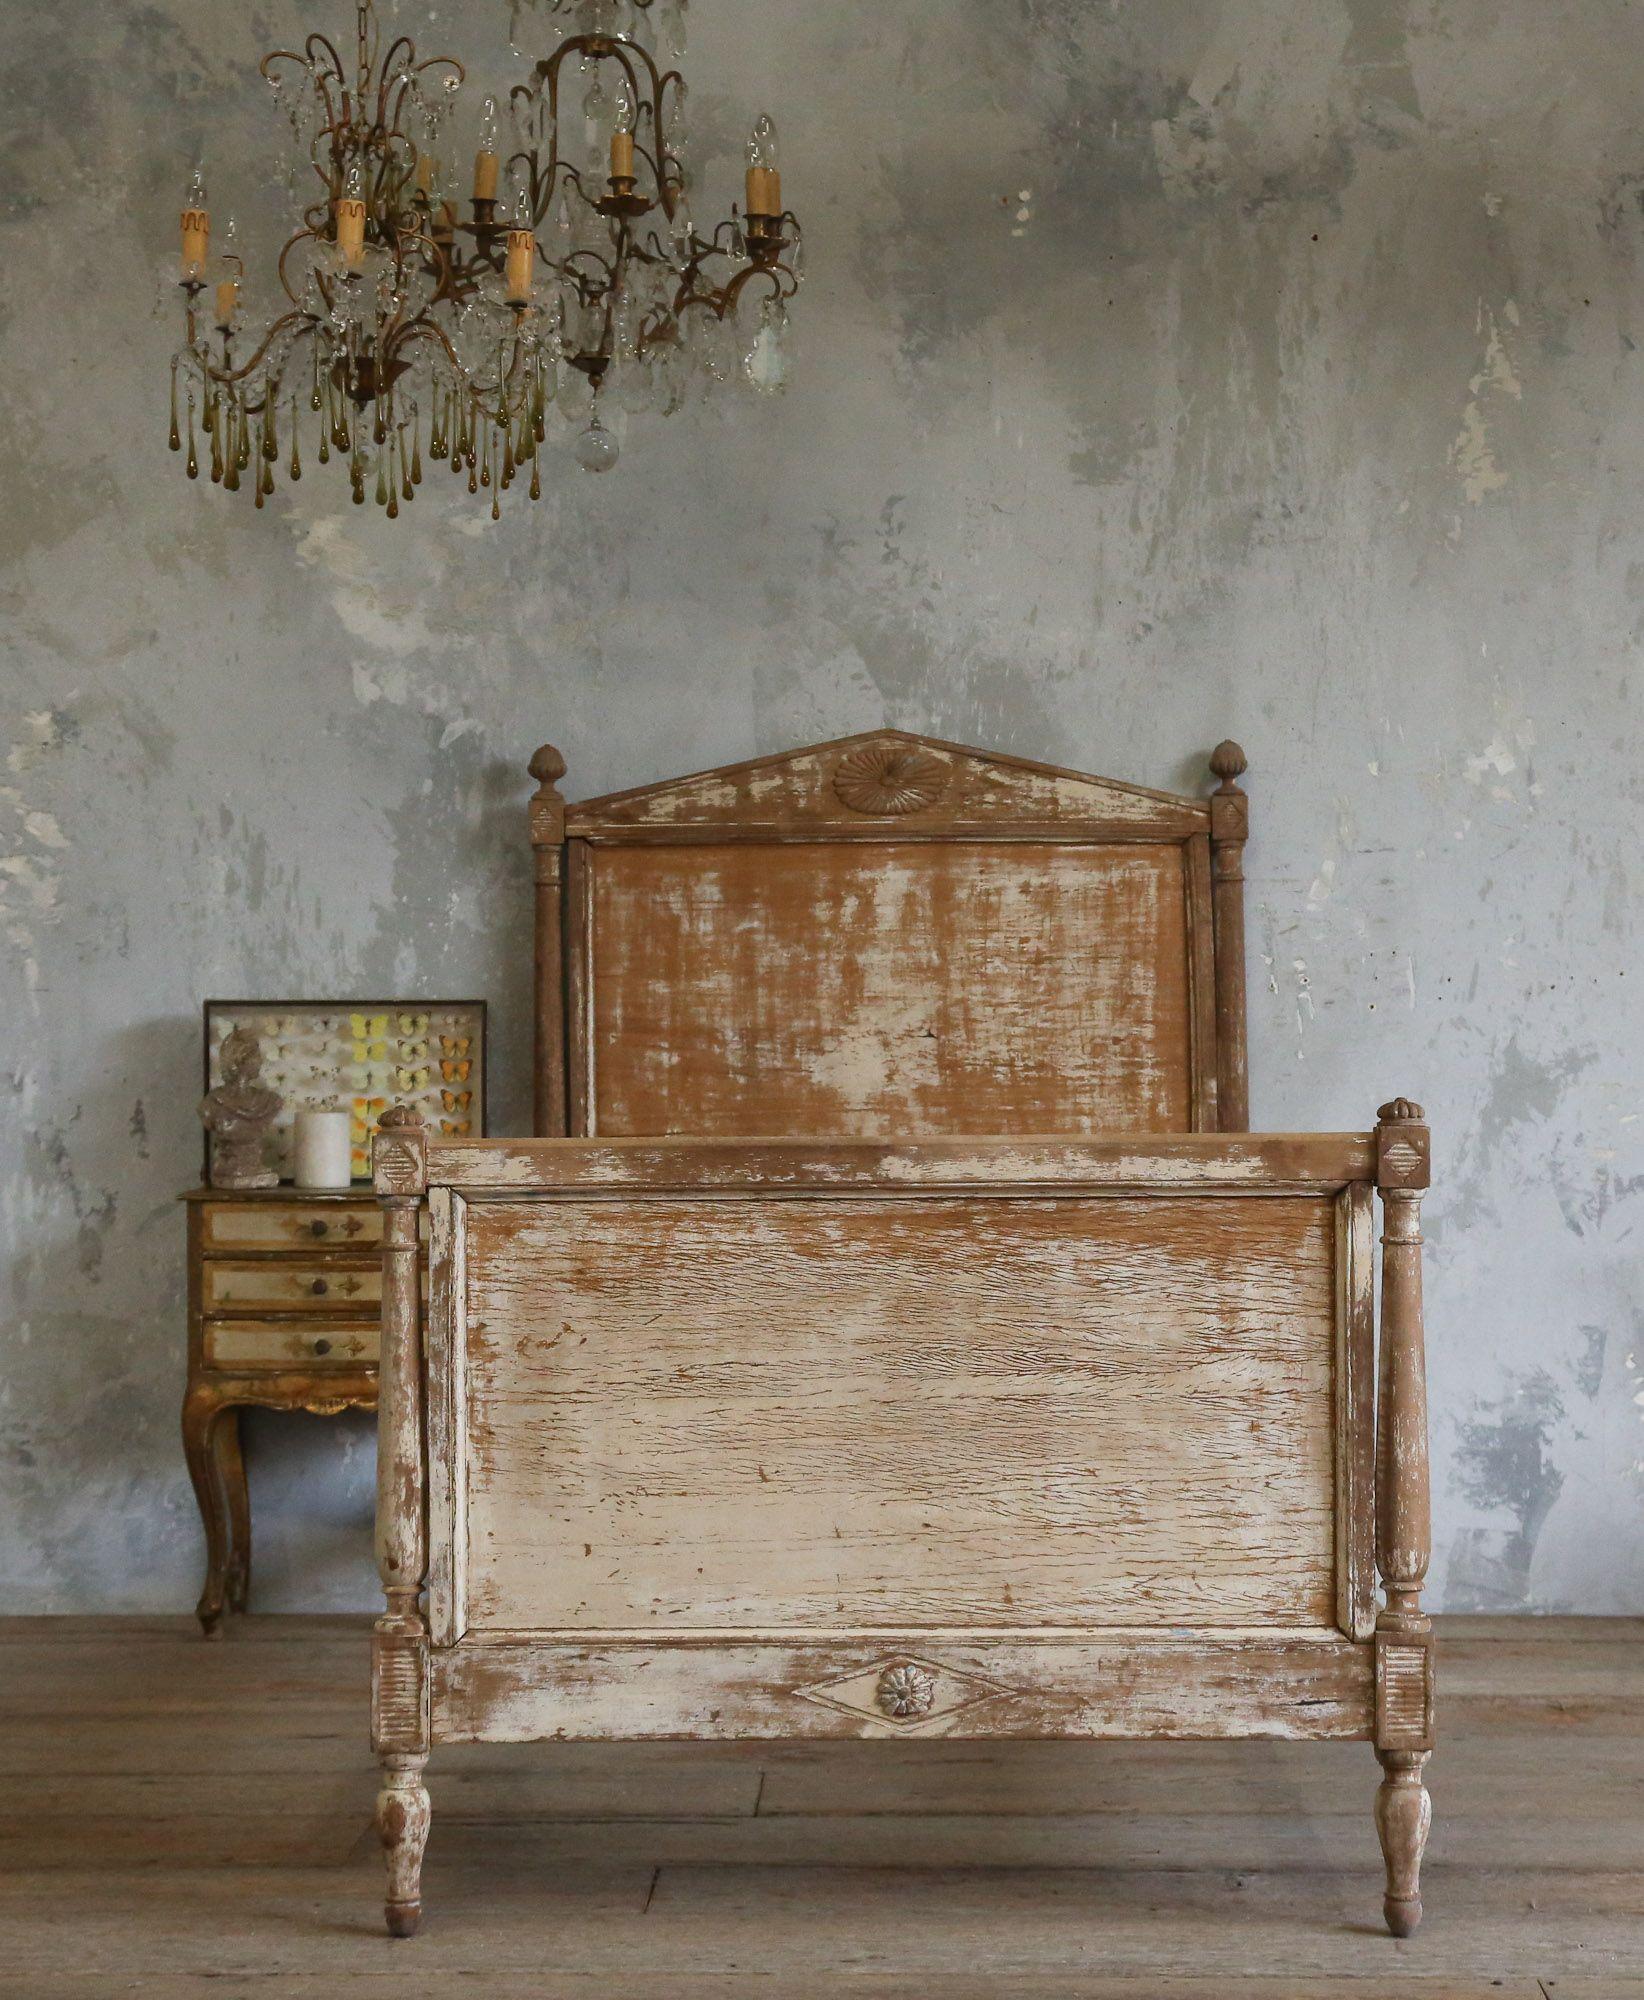 Bed Walls And Chandelier Furniture Spiration